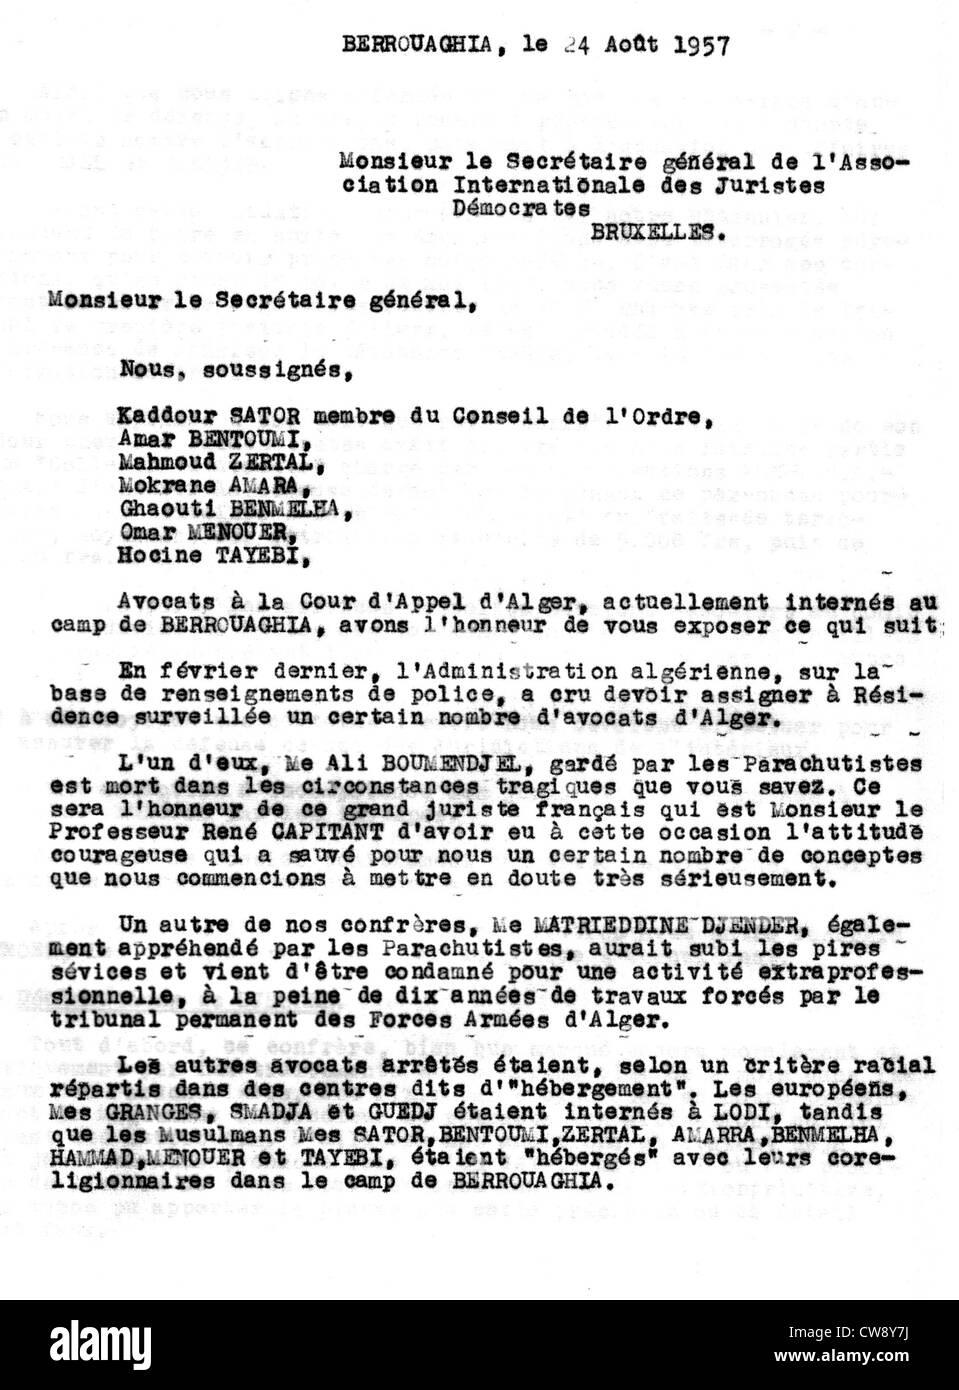 Letter written to International Association Democratic Jurists imprisoned Algerian lawyers - Stock Image